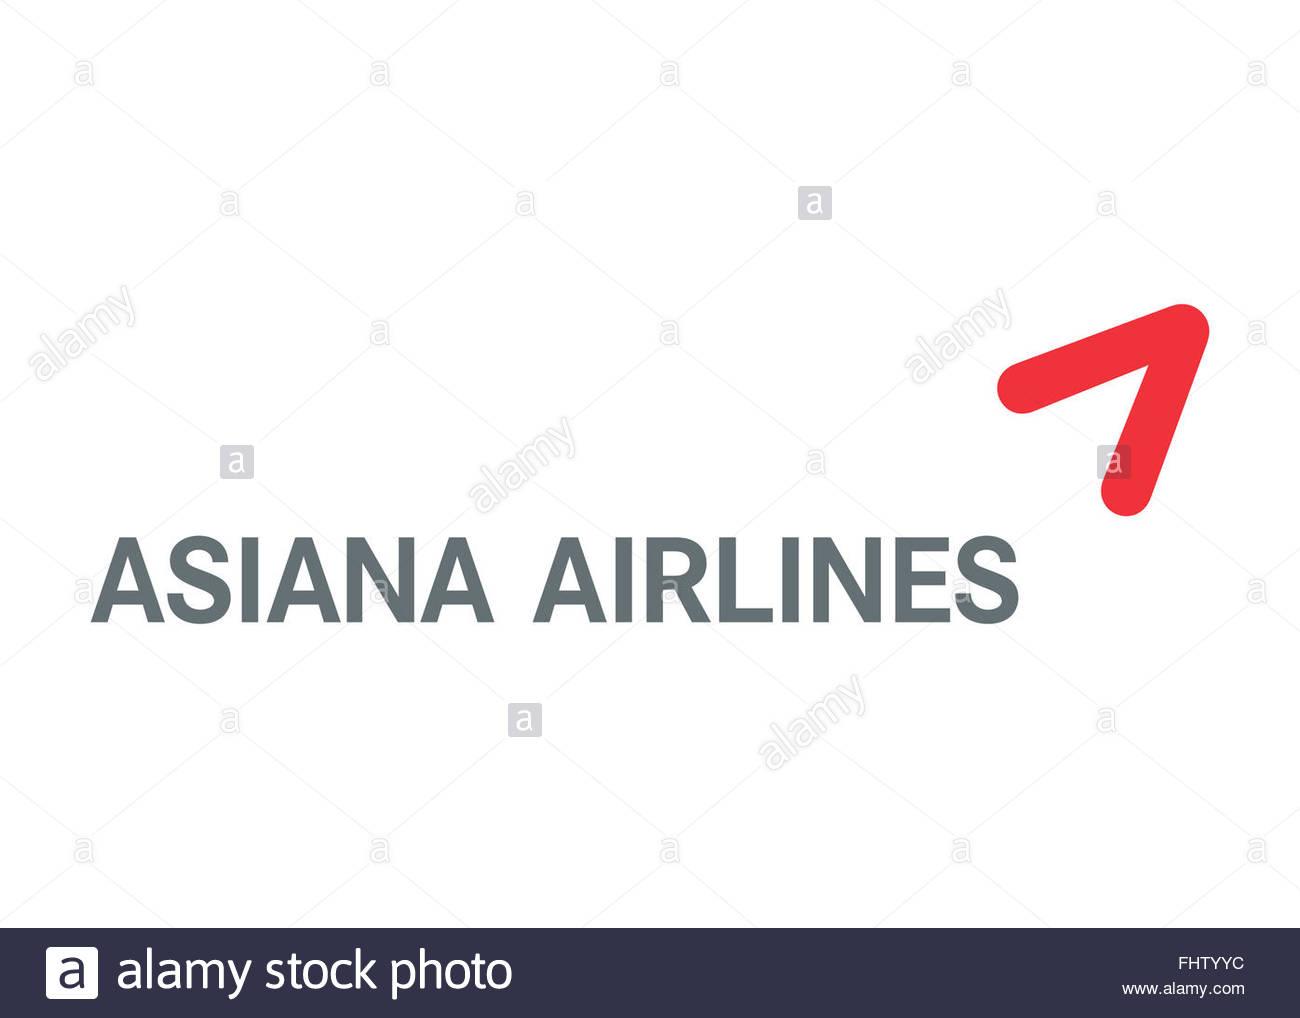 Asiana Airlines logo Stock Photo